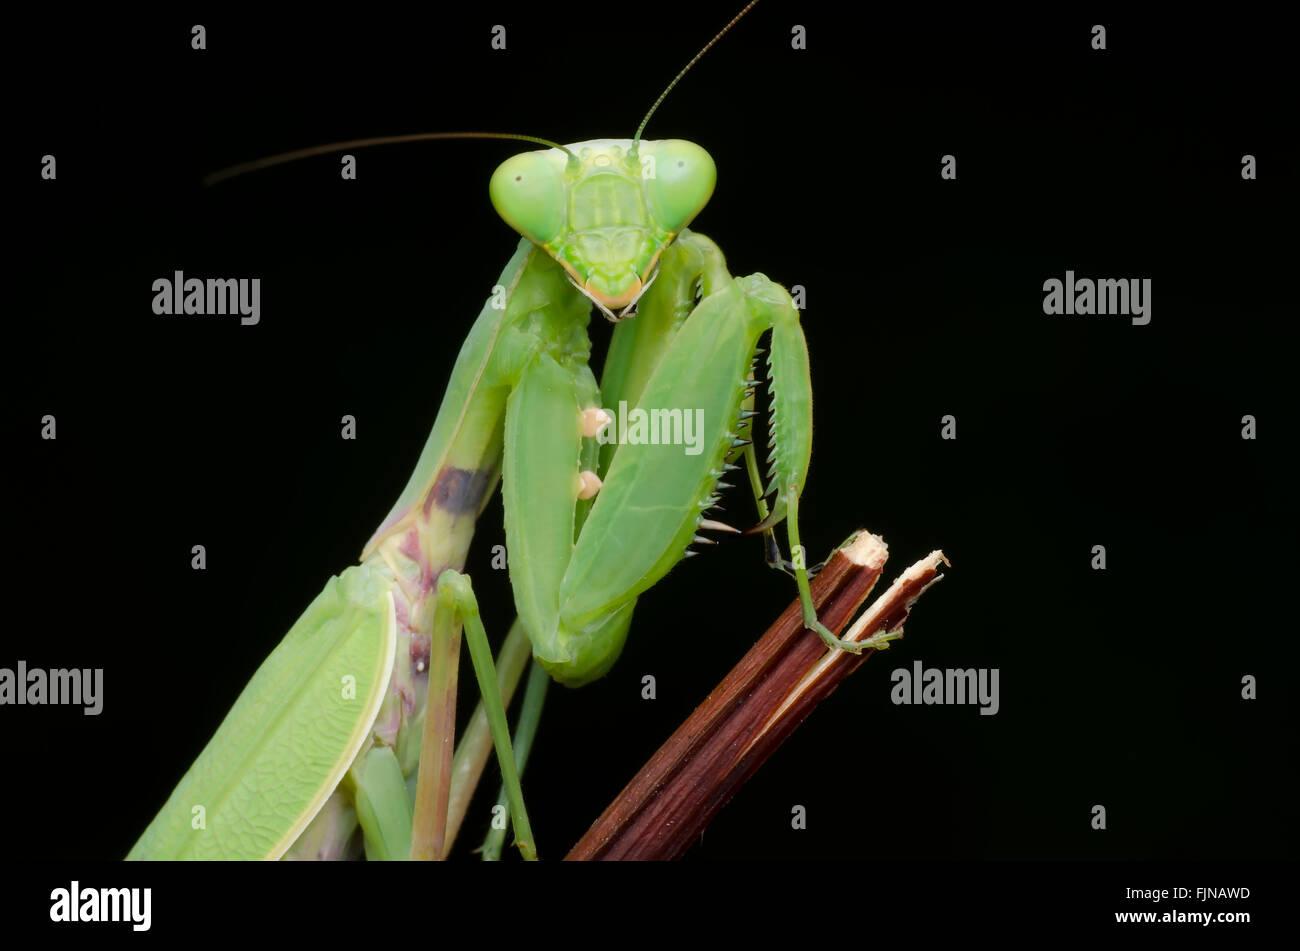 green praying mantis isolated on black background Stock Photo